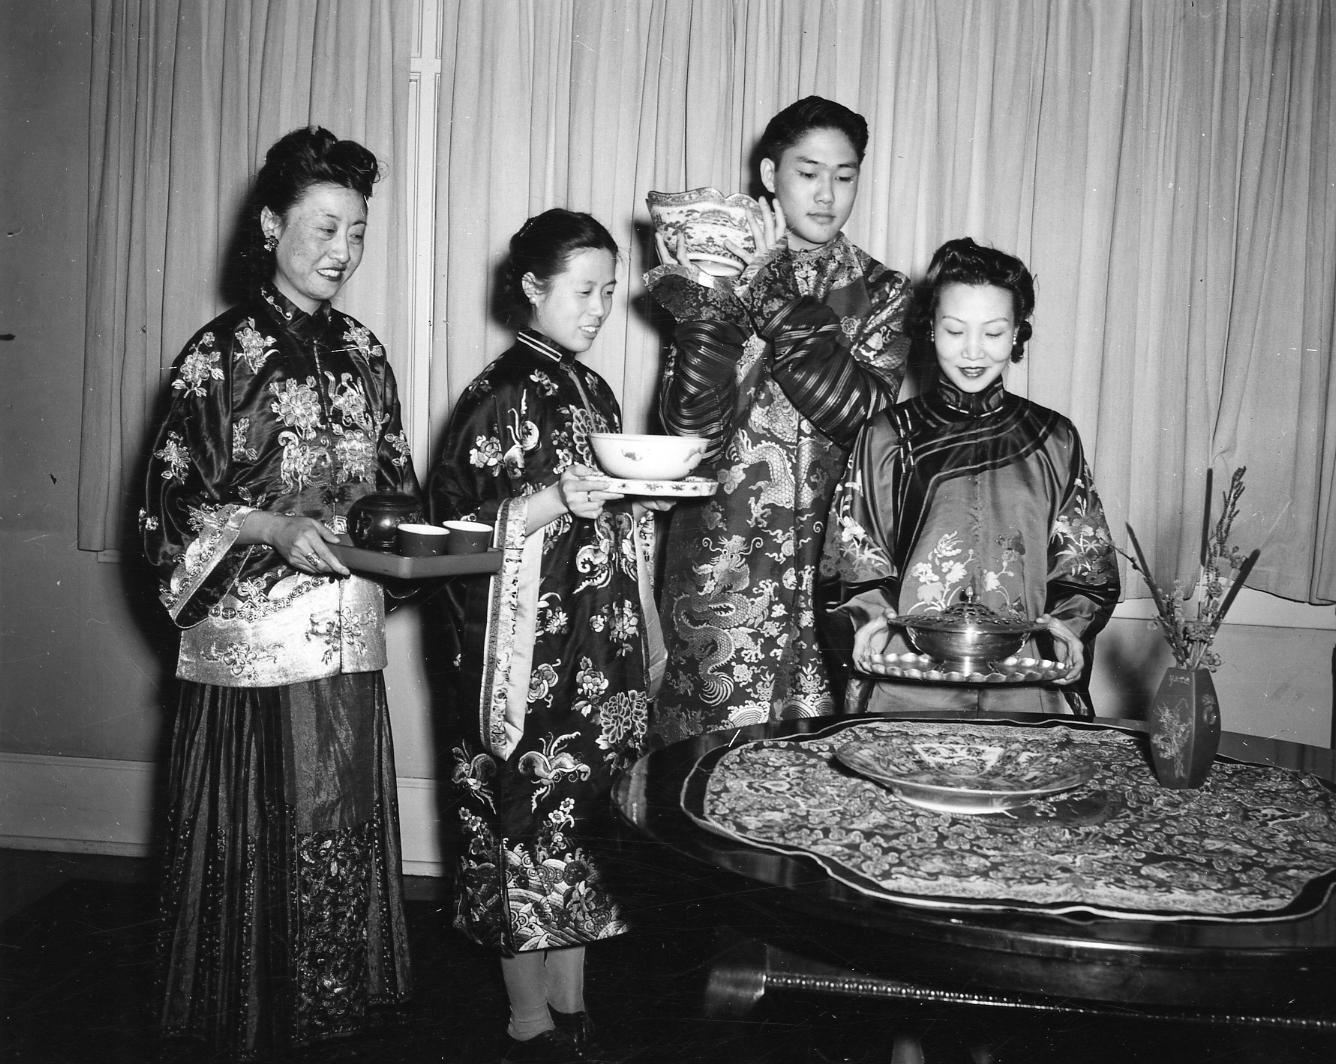 International Festival, 1943